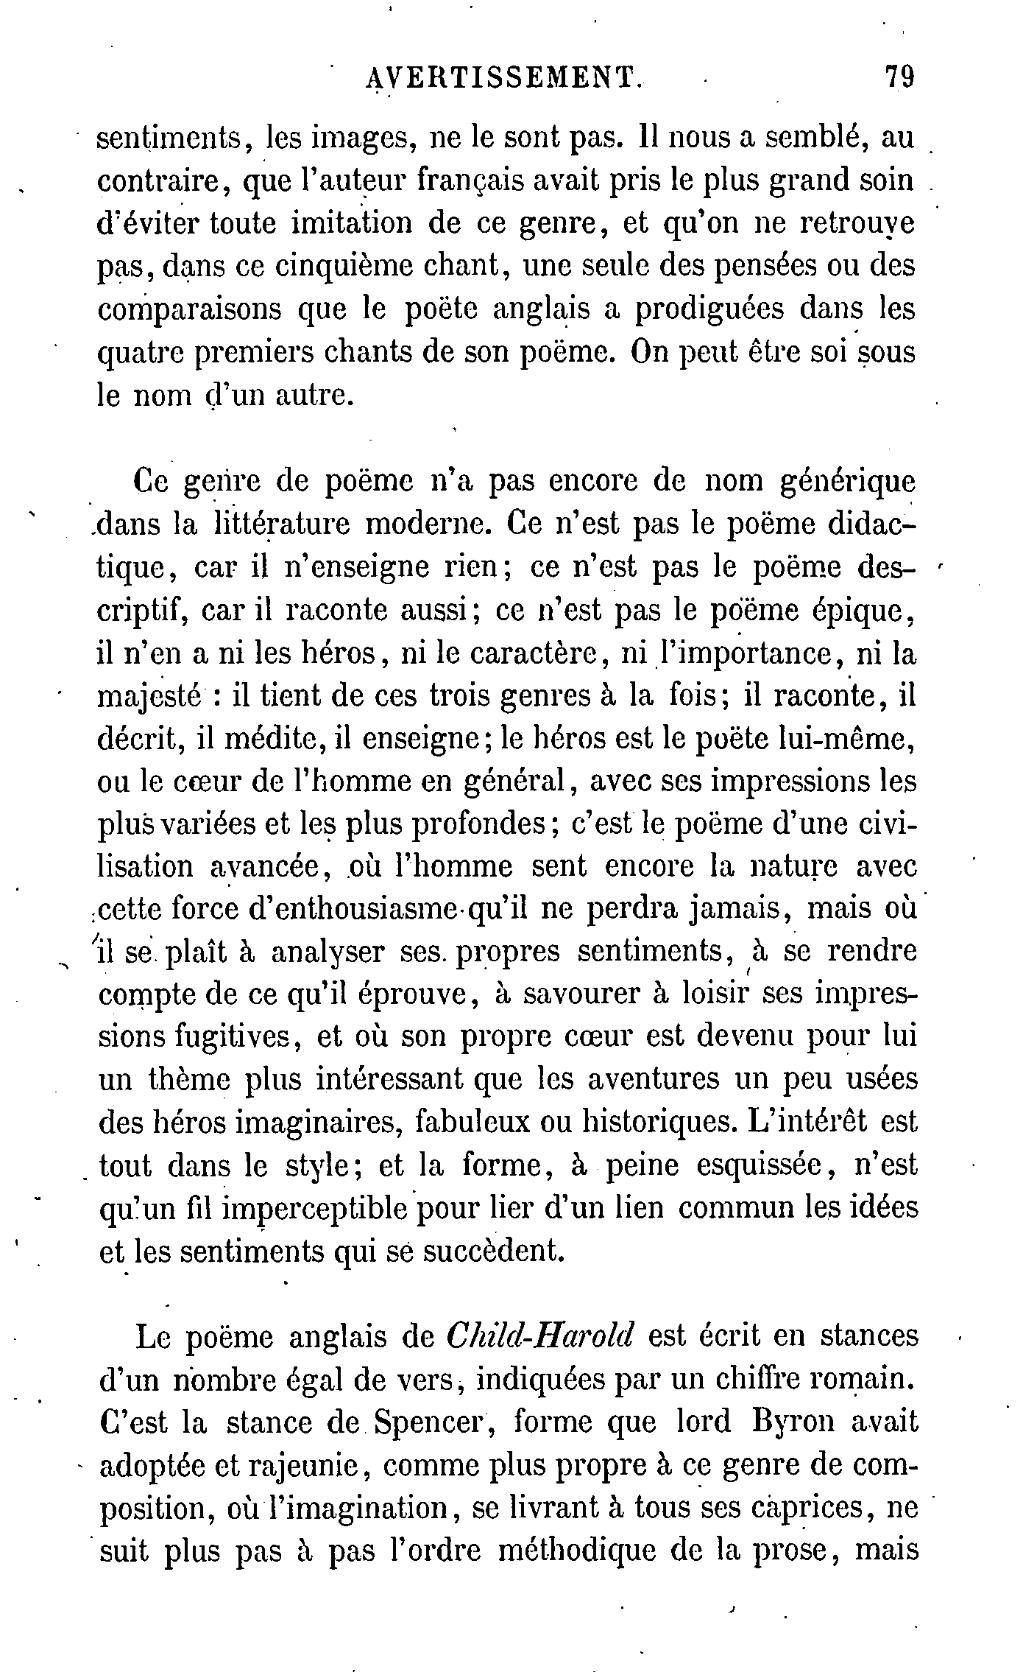 Pagelamartine œuvres Complètes De Lamartine Tome 2djvu